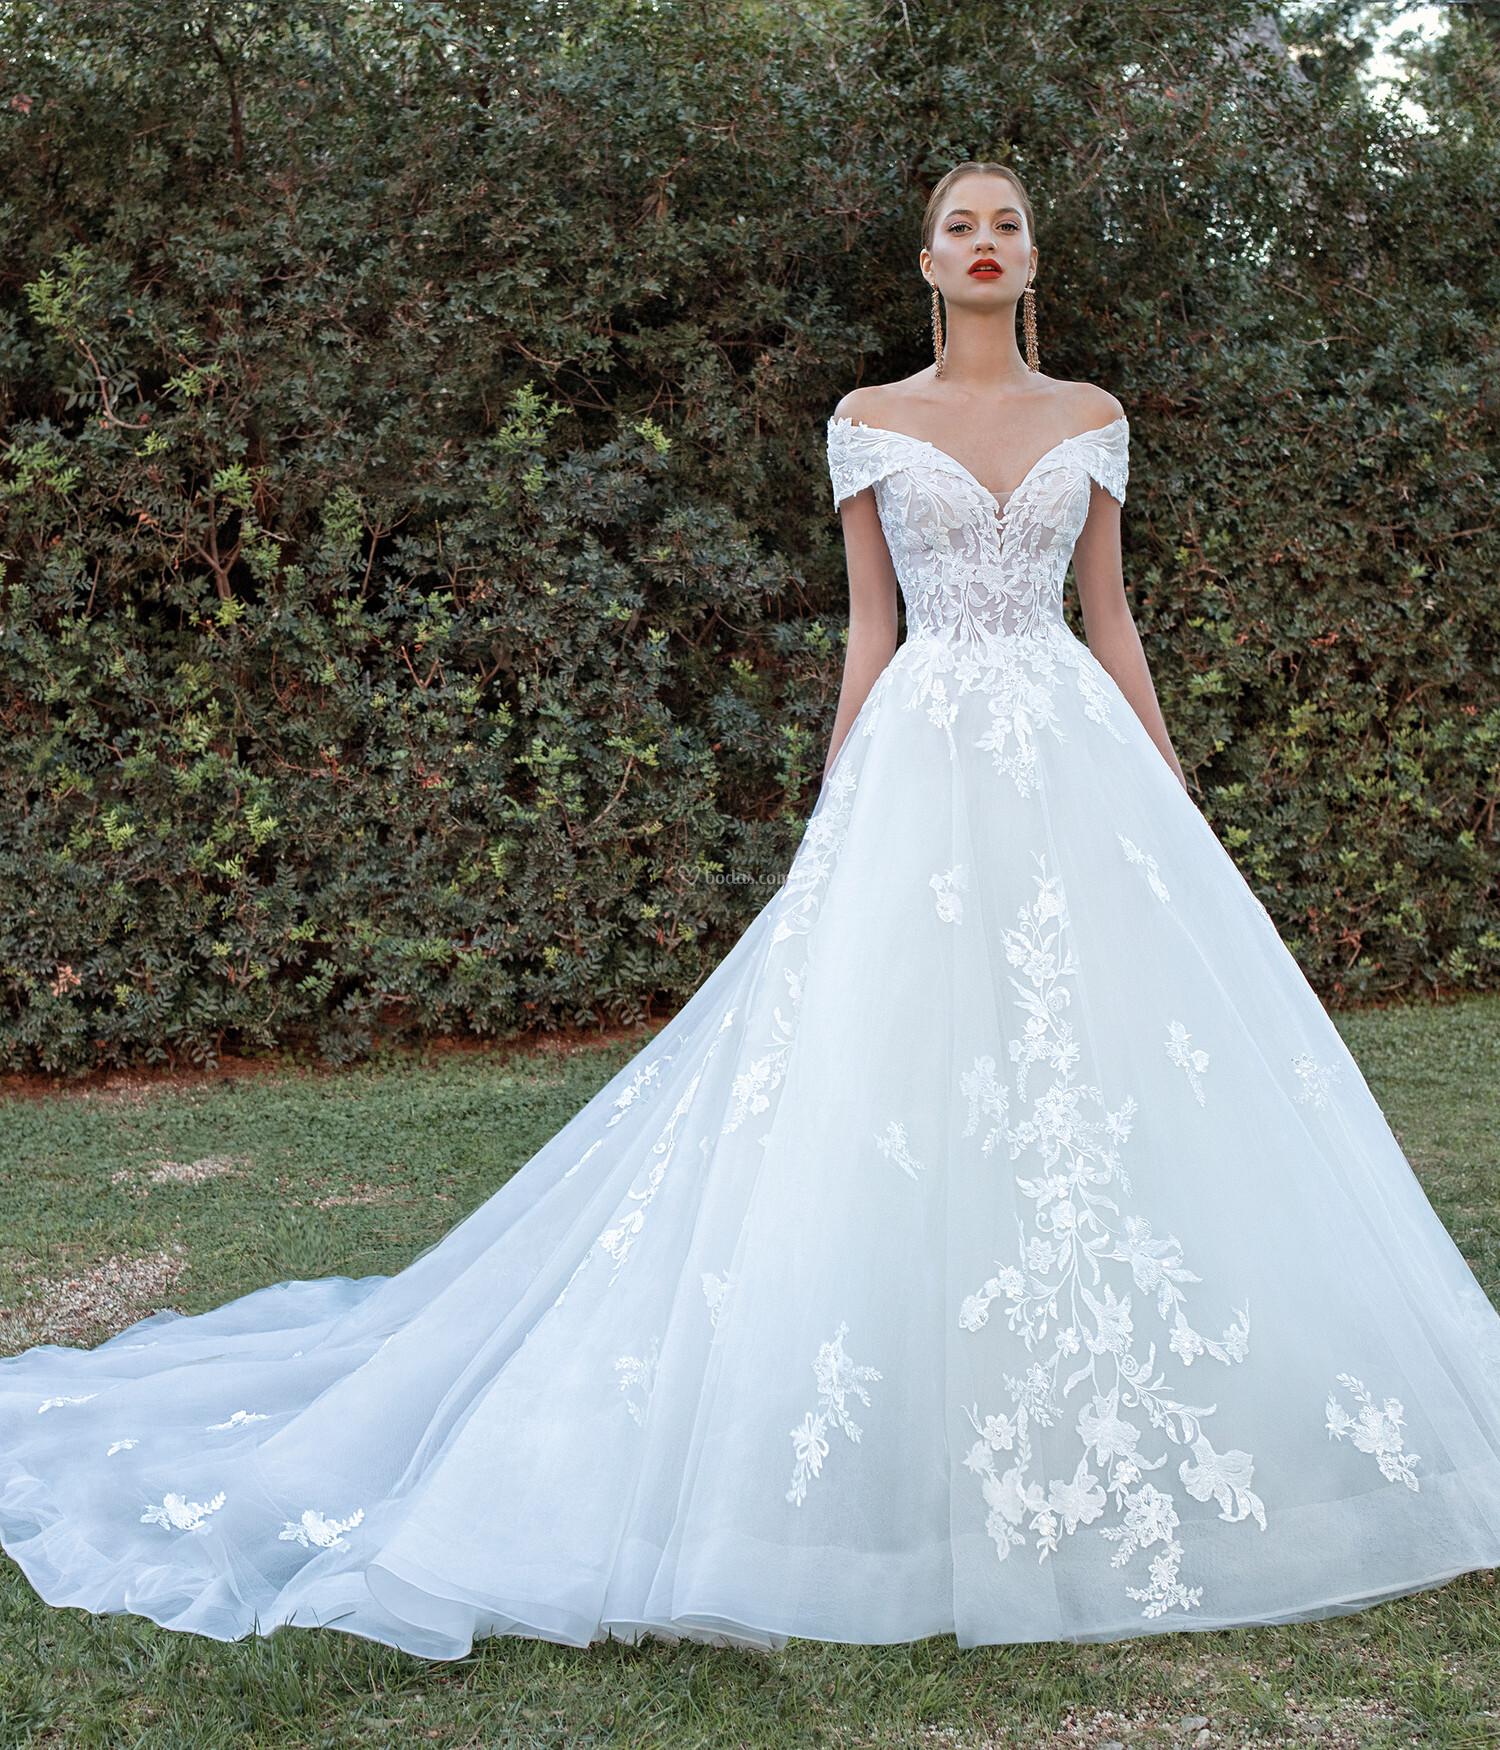 Catalogo de vestidos de novia guadalajara